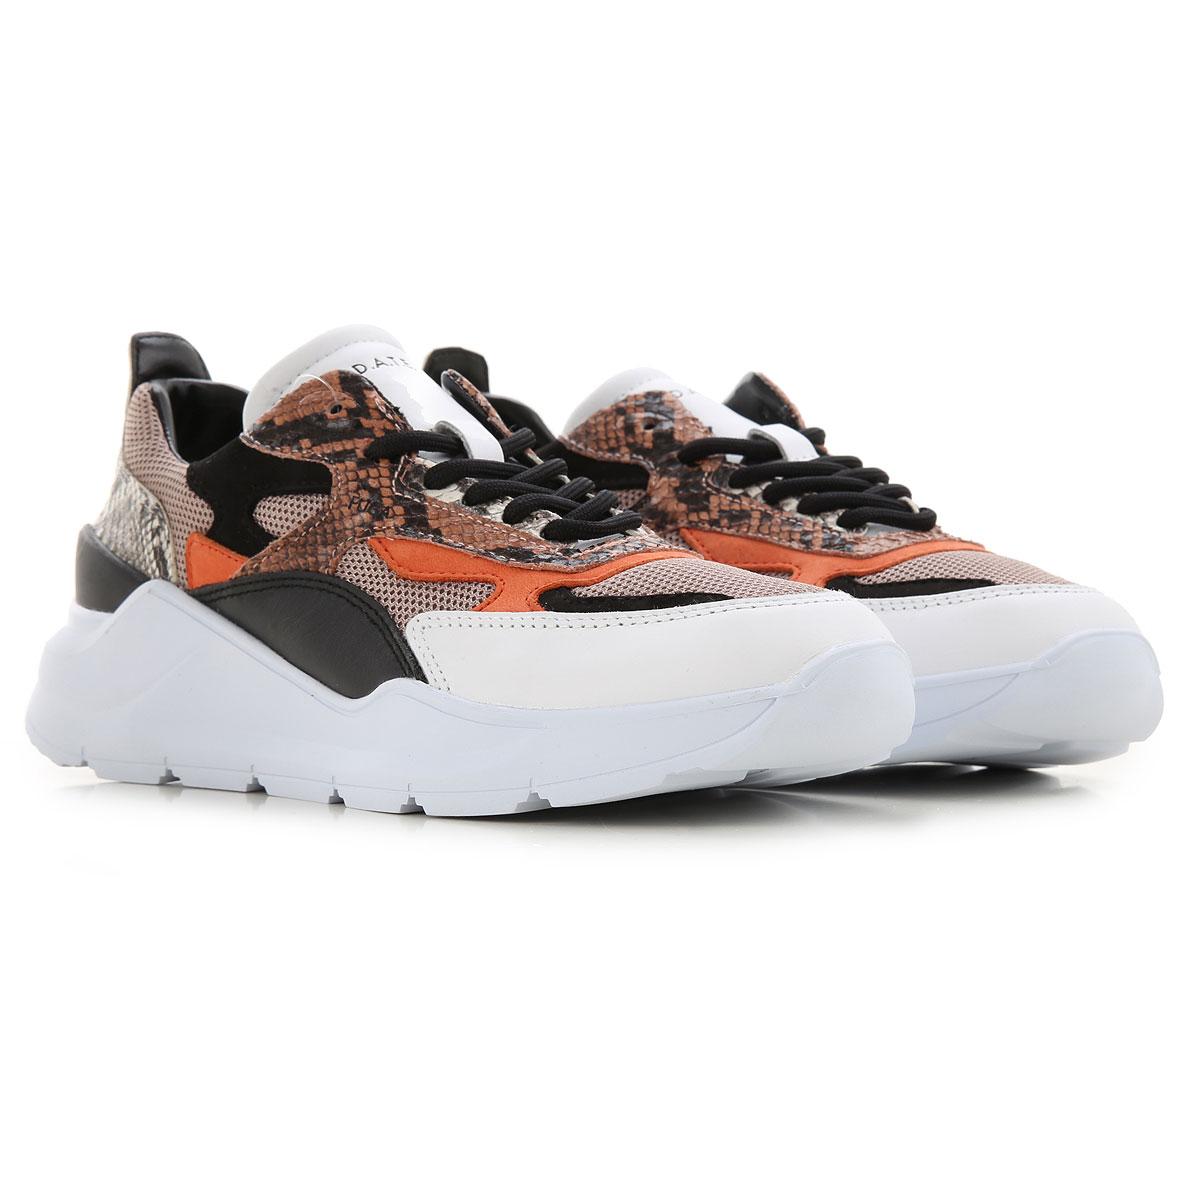 D.A.T.E. Sneakers for Women On Sale, python multicolor, Leather, 2019, US 6 - UK 3 5 - EU 36 - JP 22 5 US 7 5 - UK 5 - EU 38 - JP 24 US 9 - UK 6 5 - E